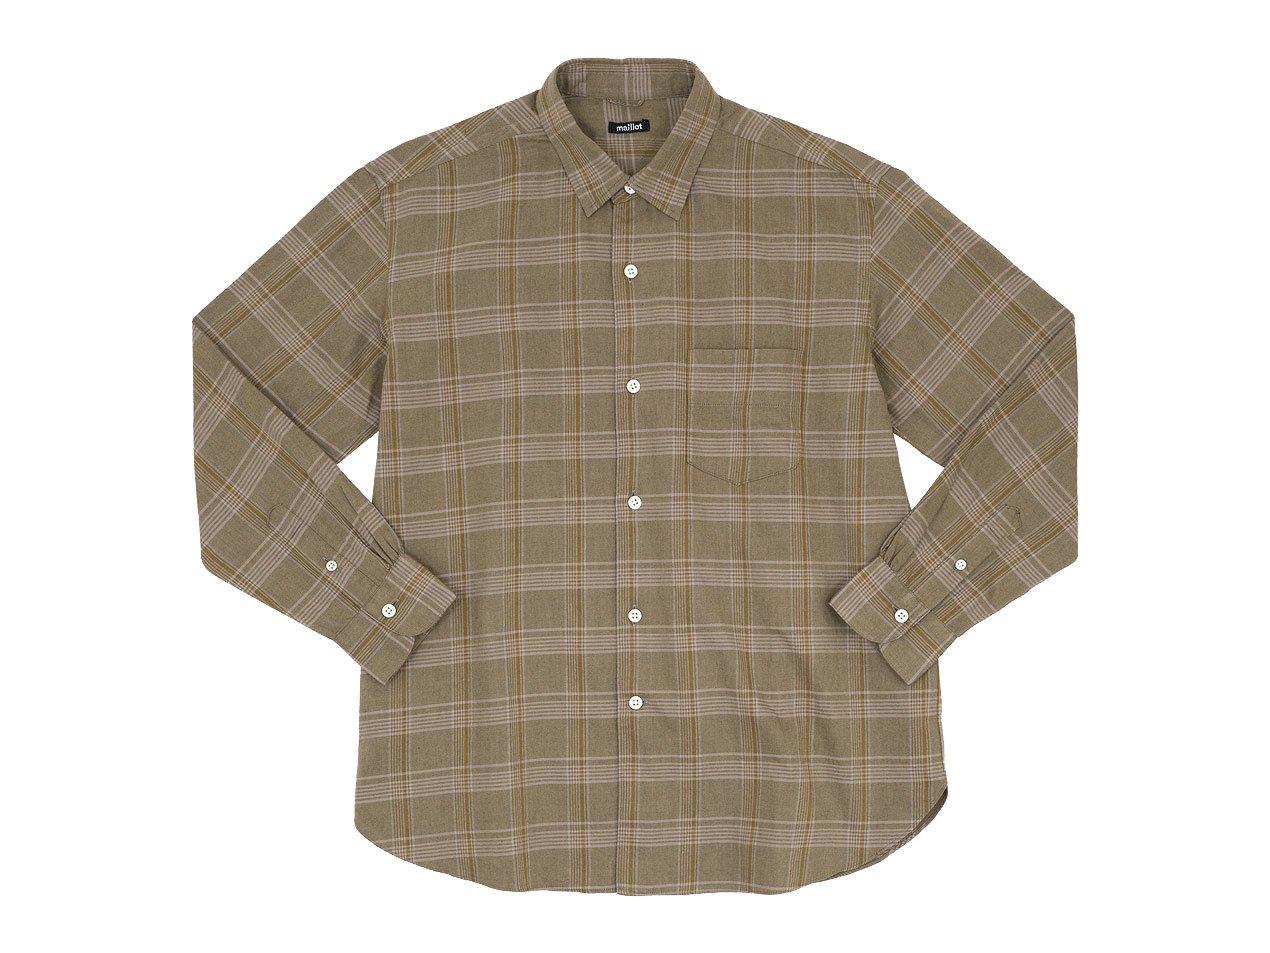 maillot mature twill check regular shirts BROWN